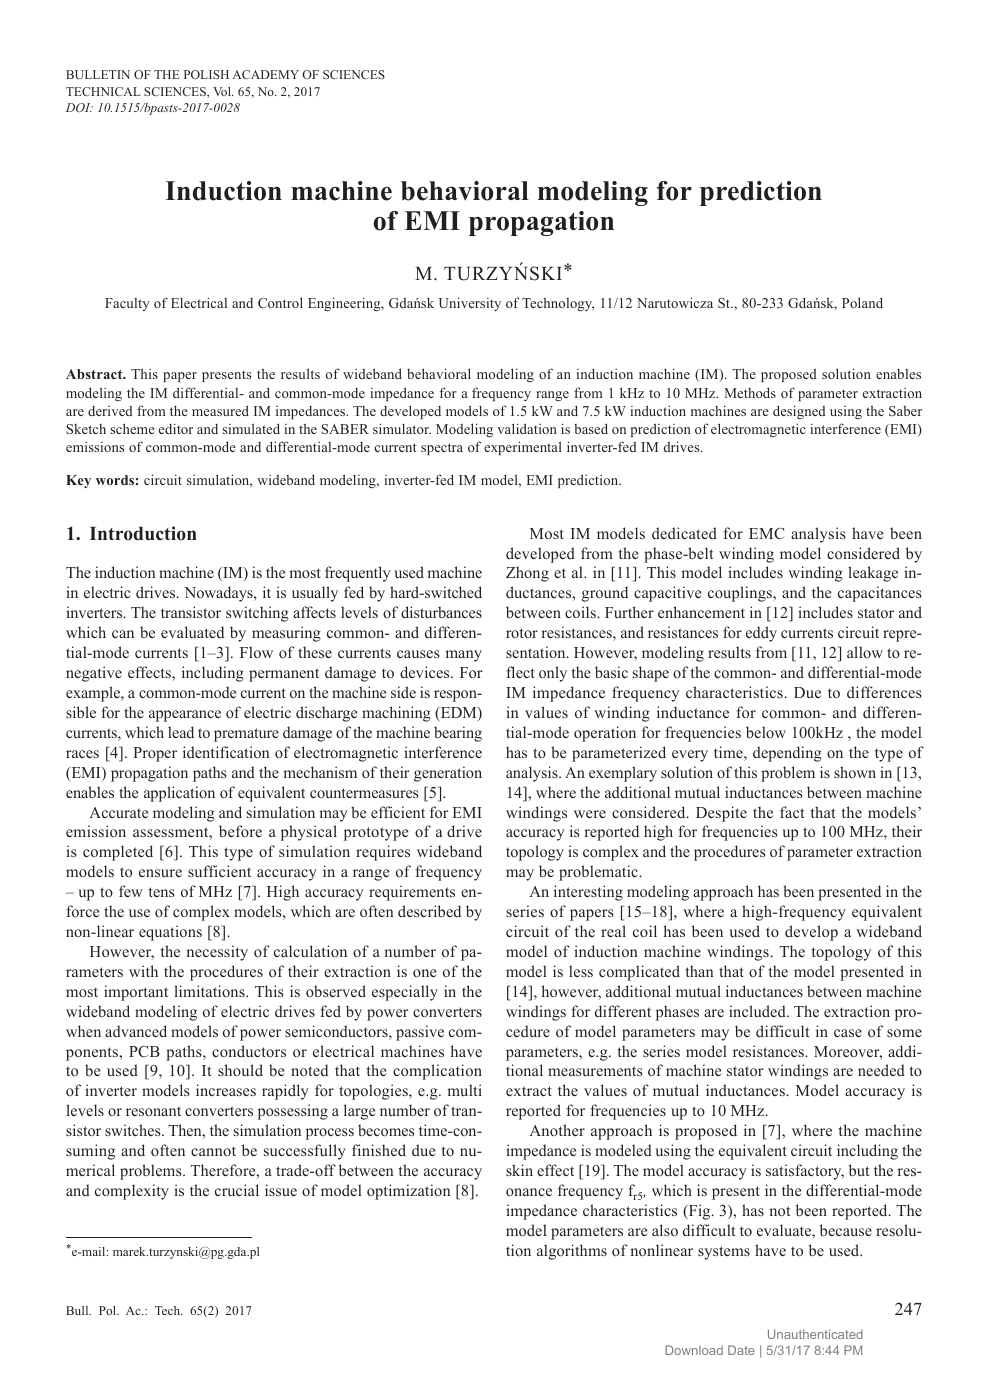 Induction machine behavioral modeling for prediction of EMI